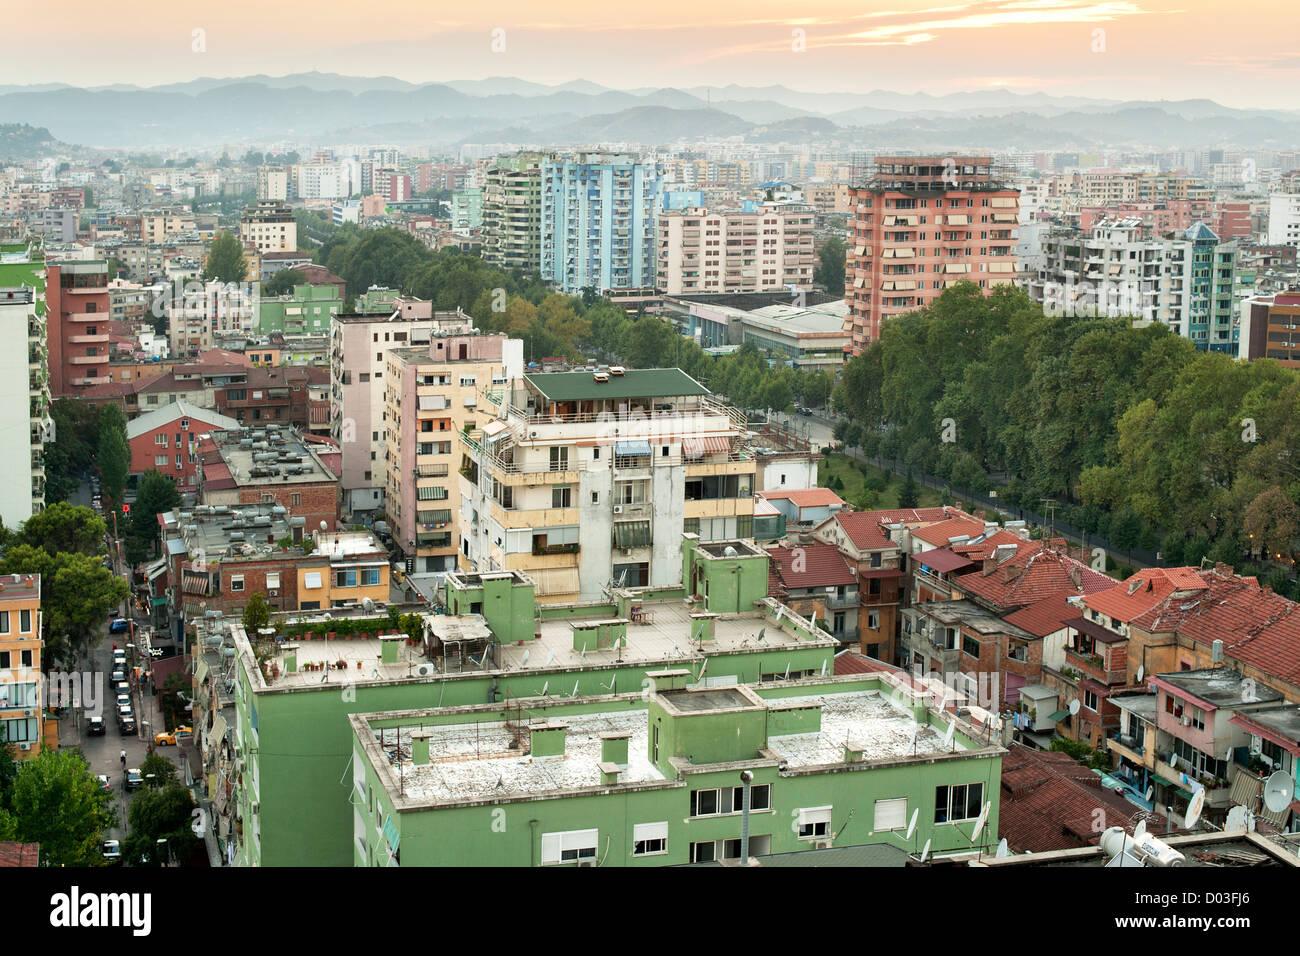 View across the city of Tirana, the capital of Albania. - Stock Image